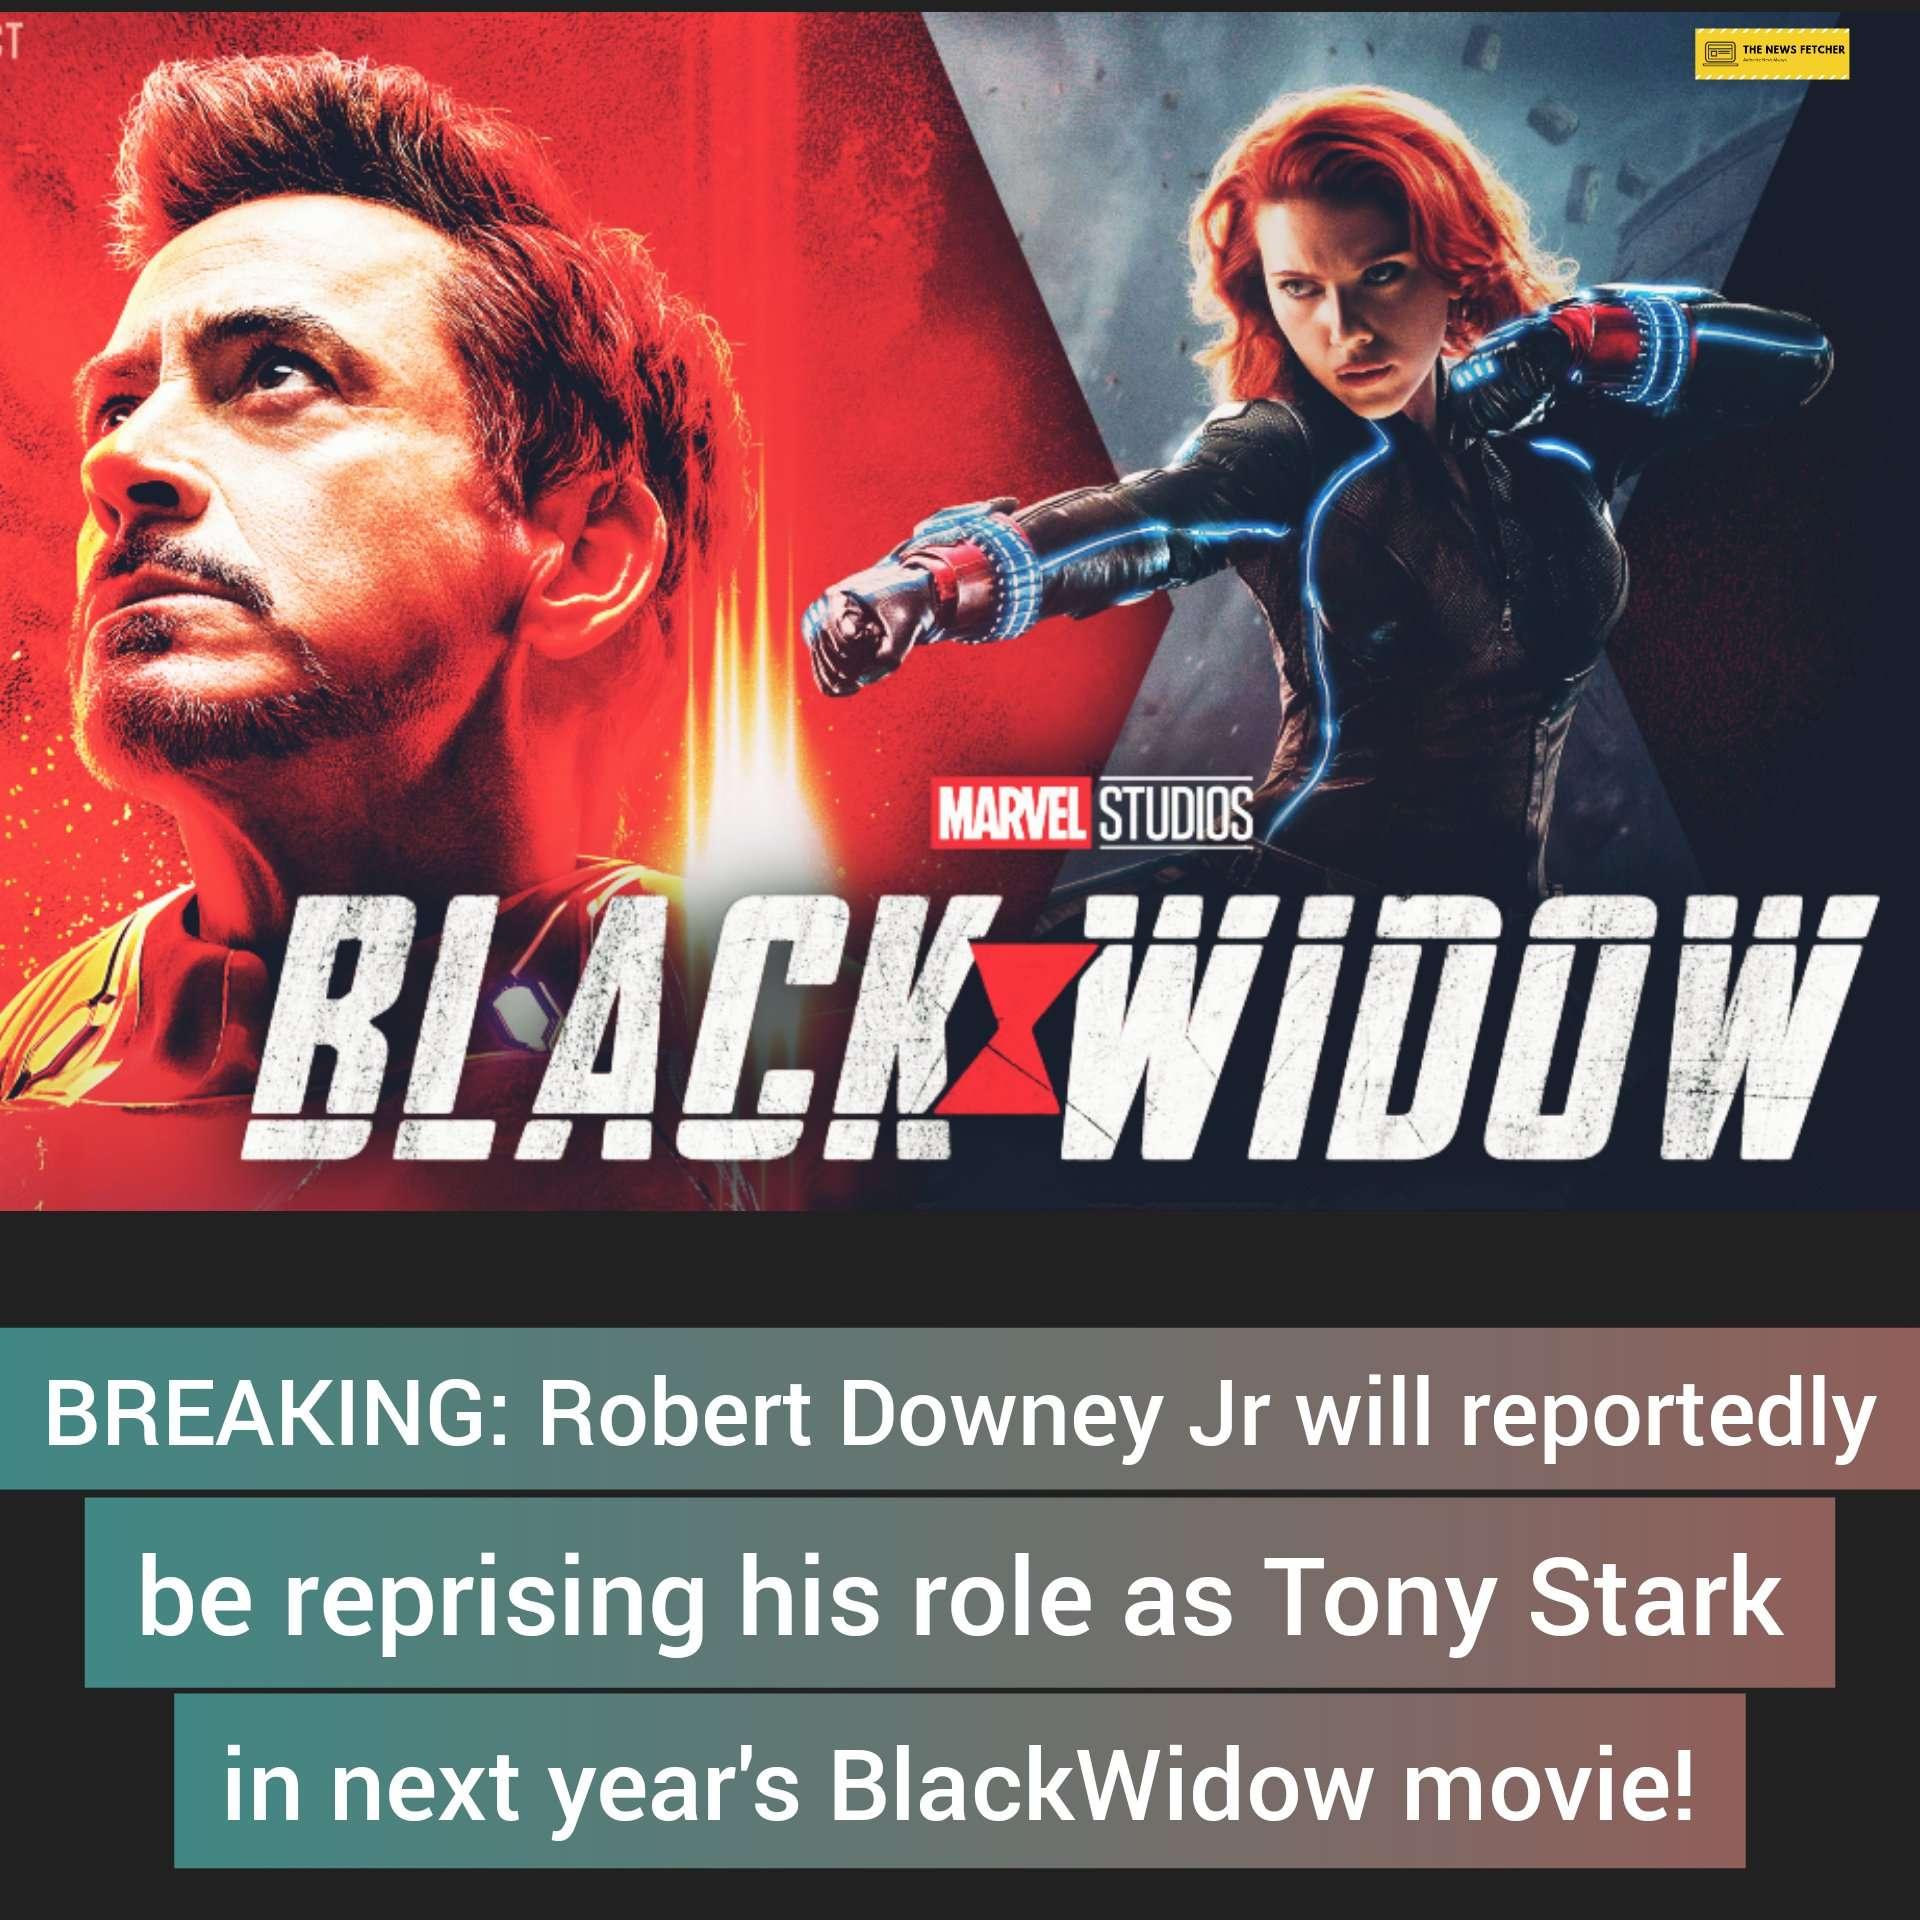 Tony Stark to return in Black Widow